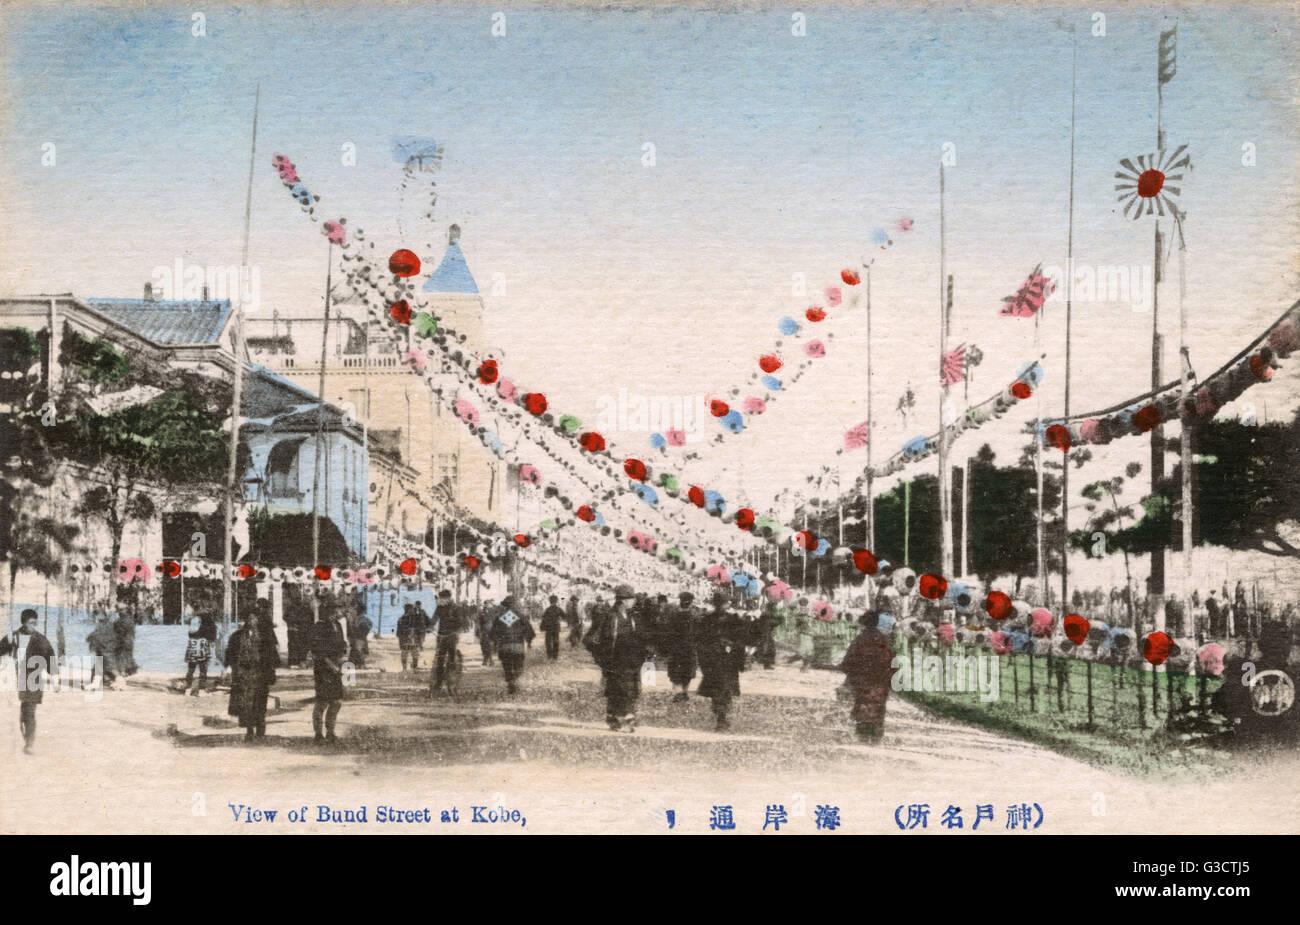 Kobe, Japan - Bund Street - paper lantern strings - Festival     Date: circa 1905 - Stock Image